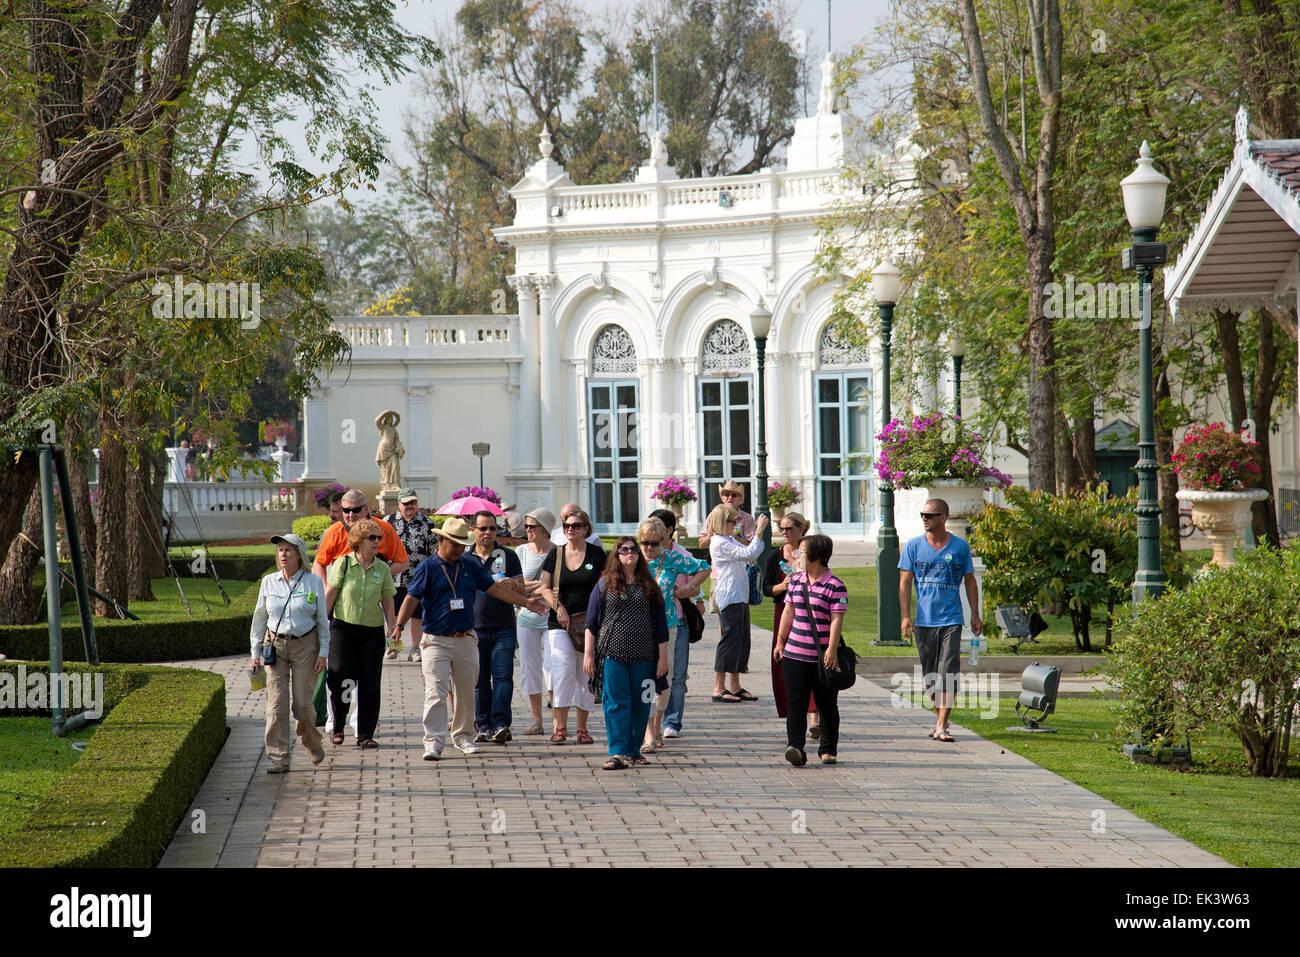 Tour guide with a party of visitors at Bang Pa in Palace at Ayutthaya Thailand - Stock Image